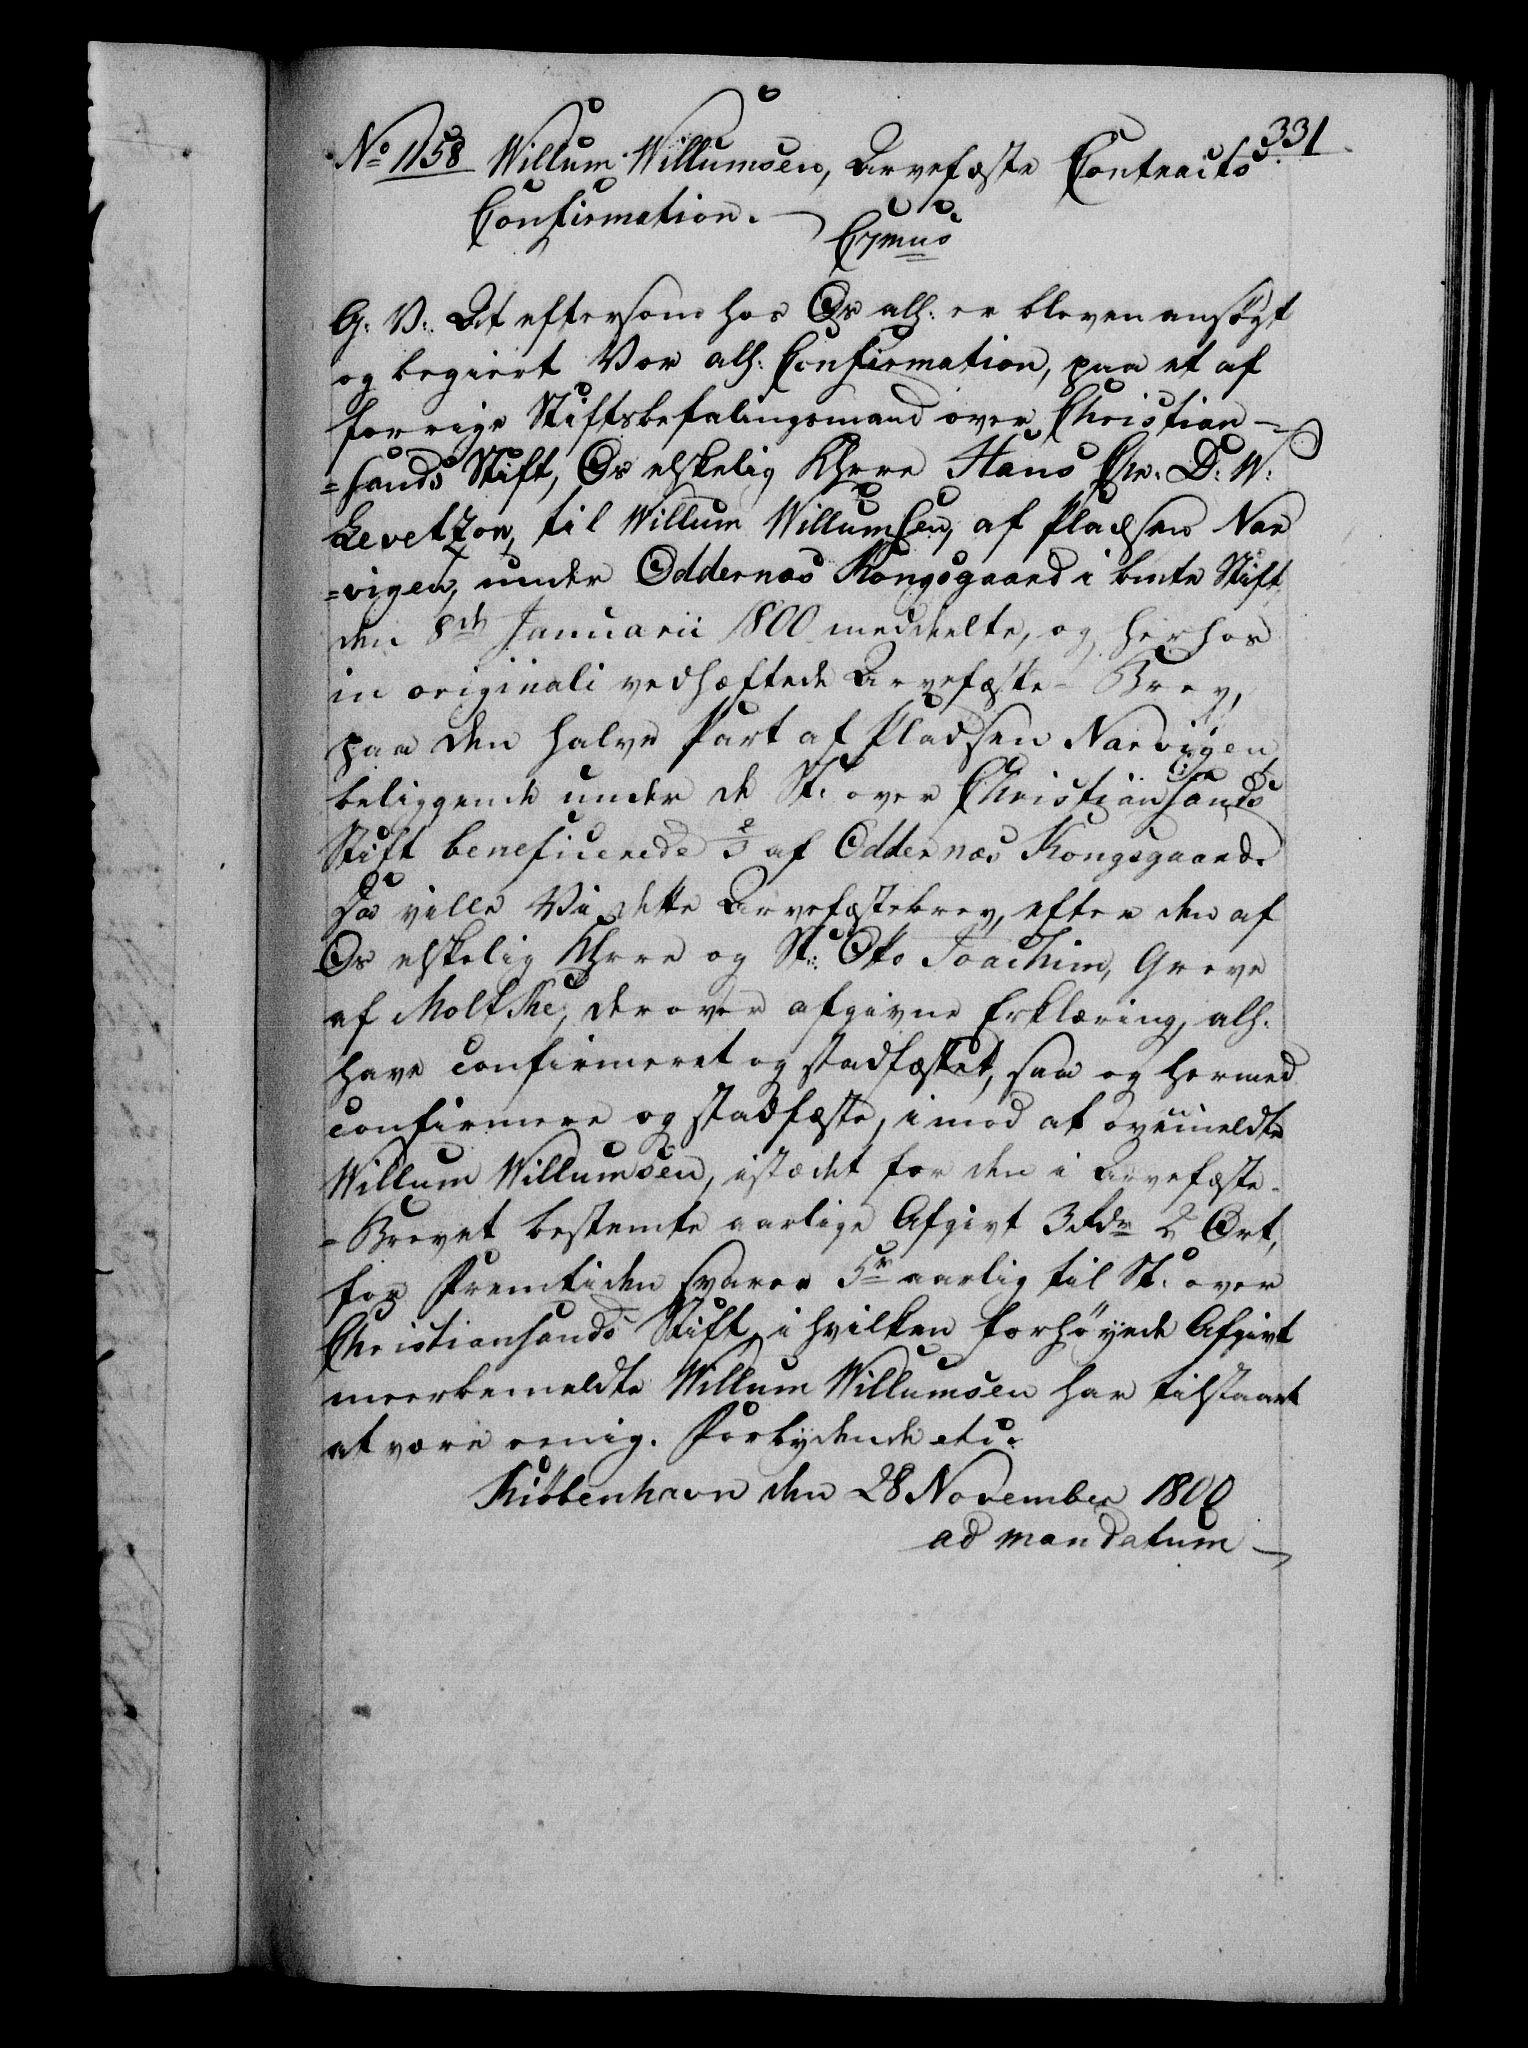 RA, Danske Kanselli 1800-1814, H/Hf/Hfb/Hfba/L0001: Registranter, 1800-1801, s. 331a